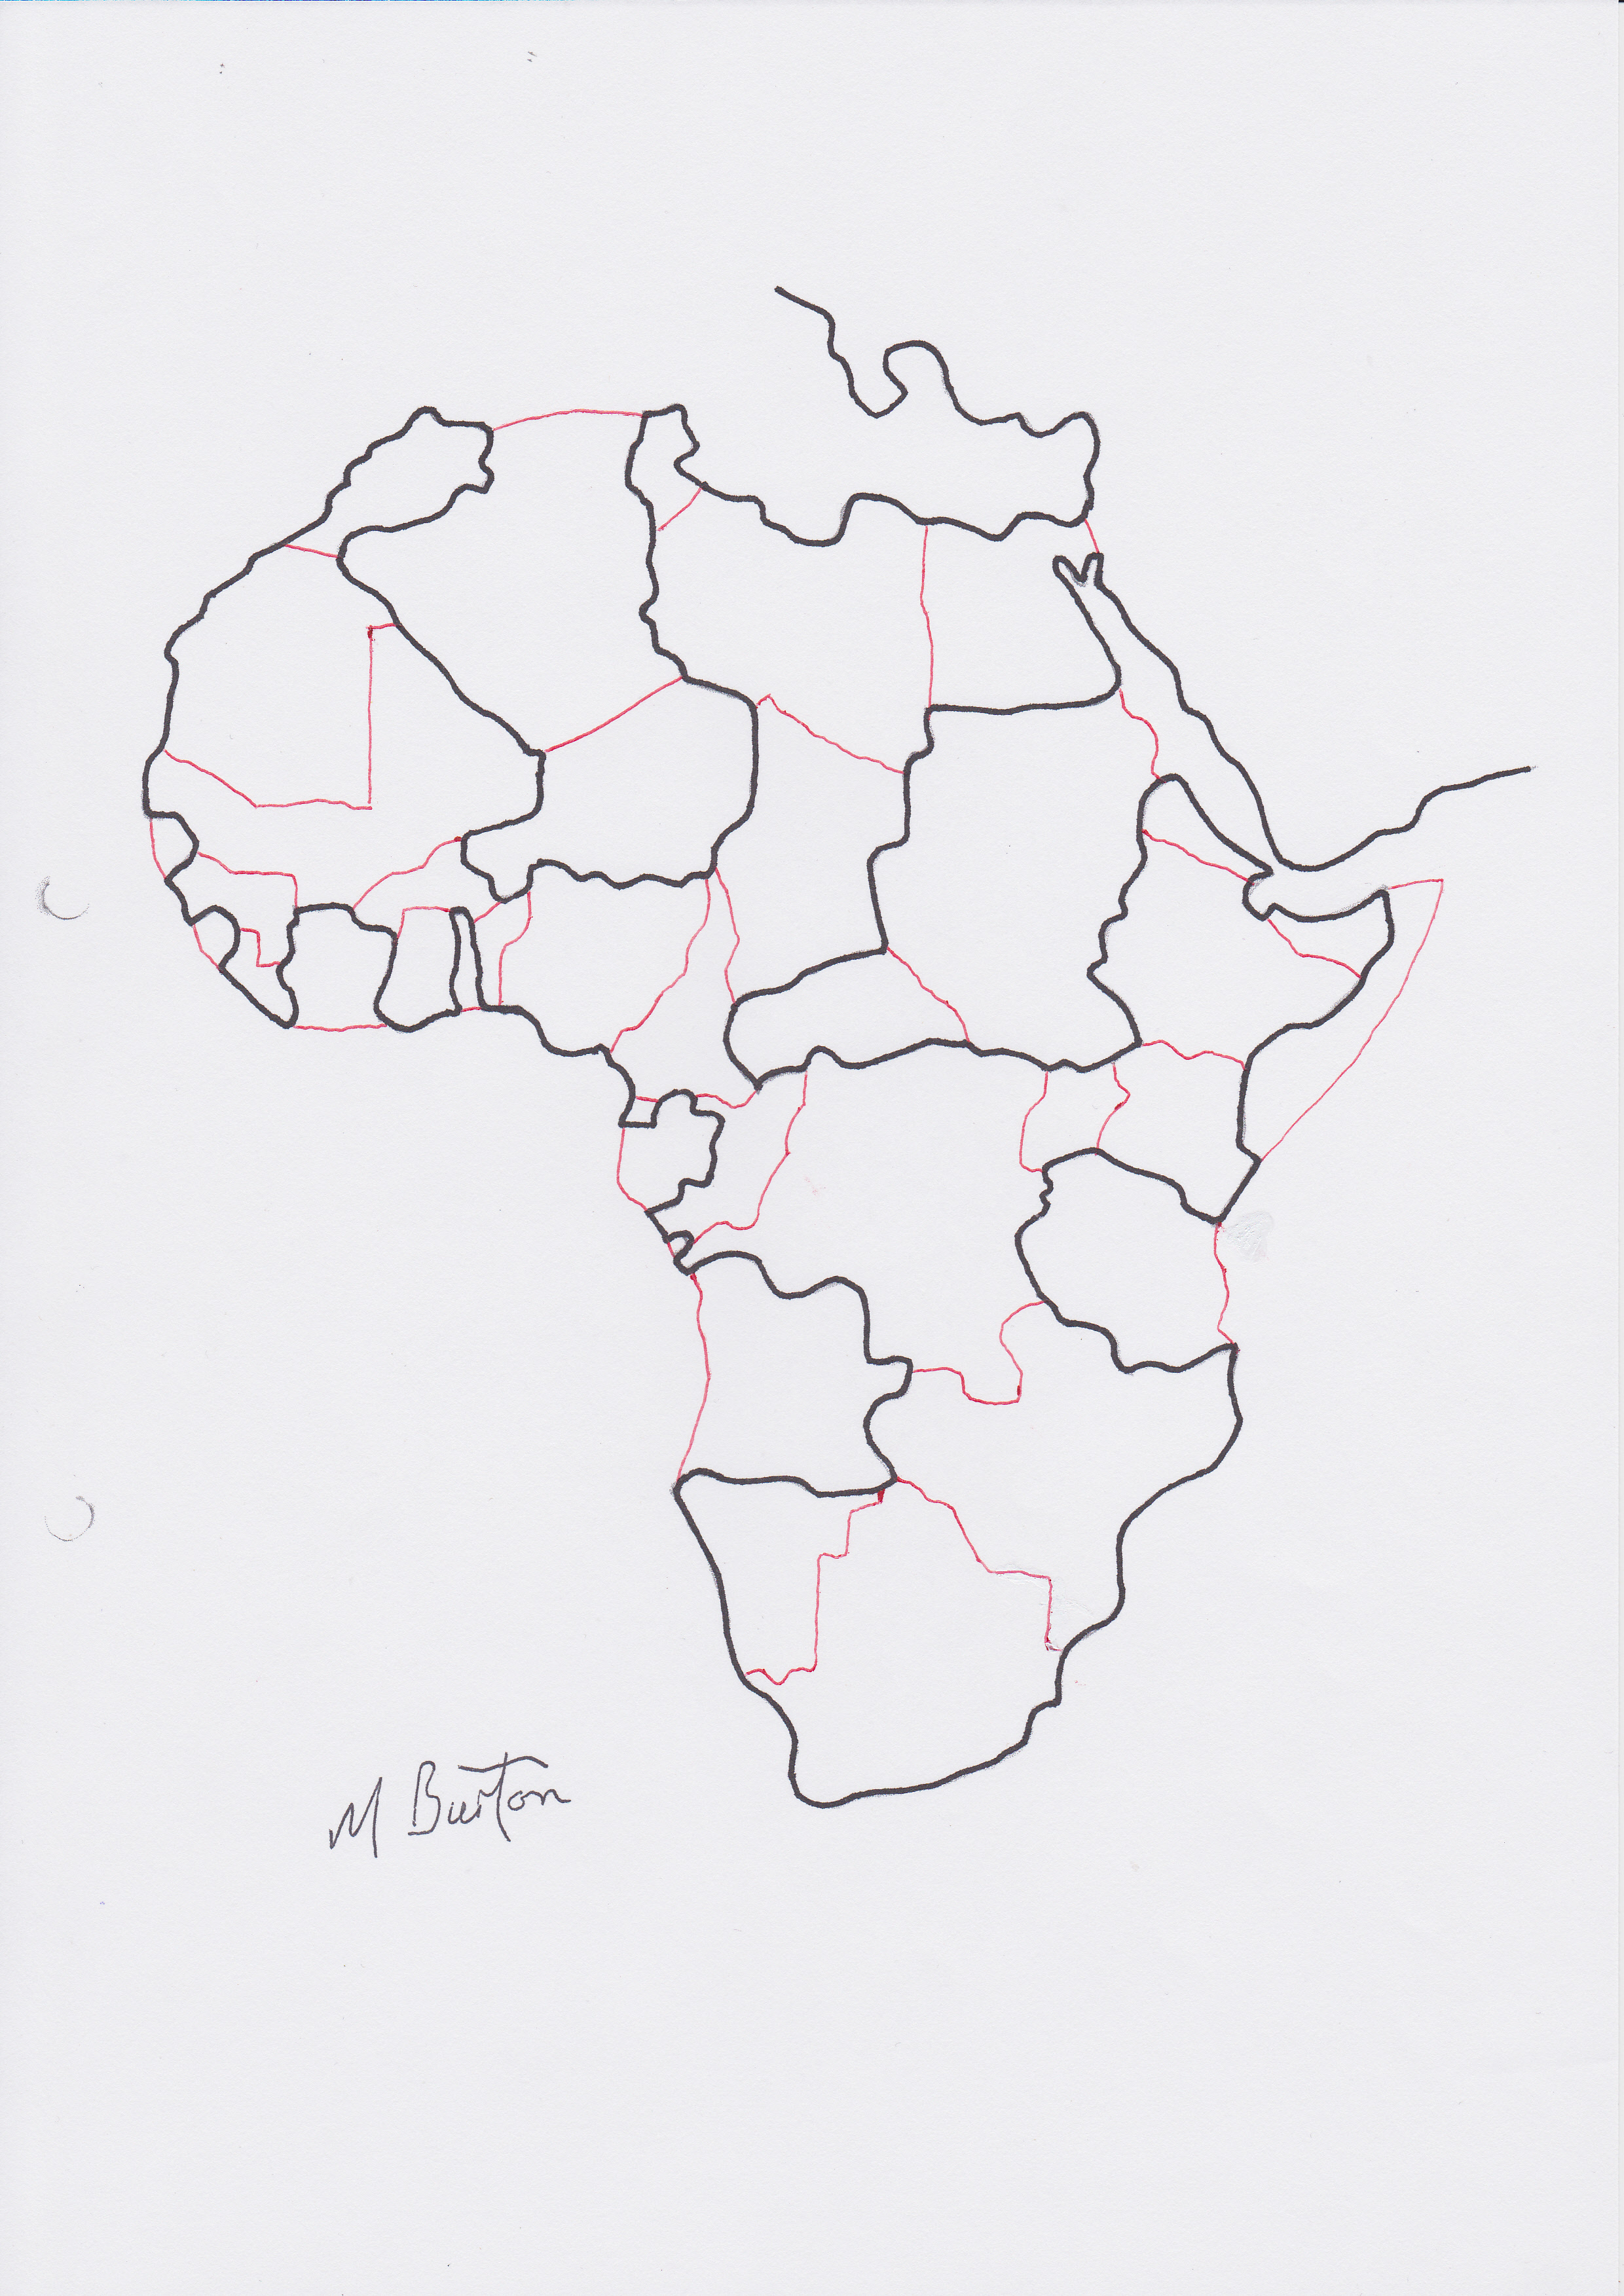 2480x3507 Africa Mick Burton